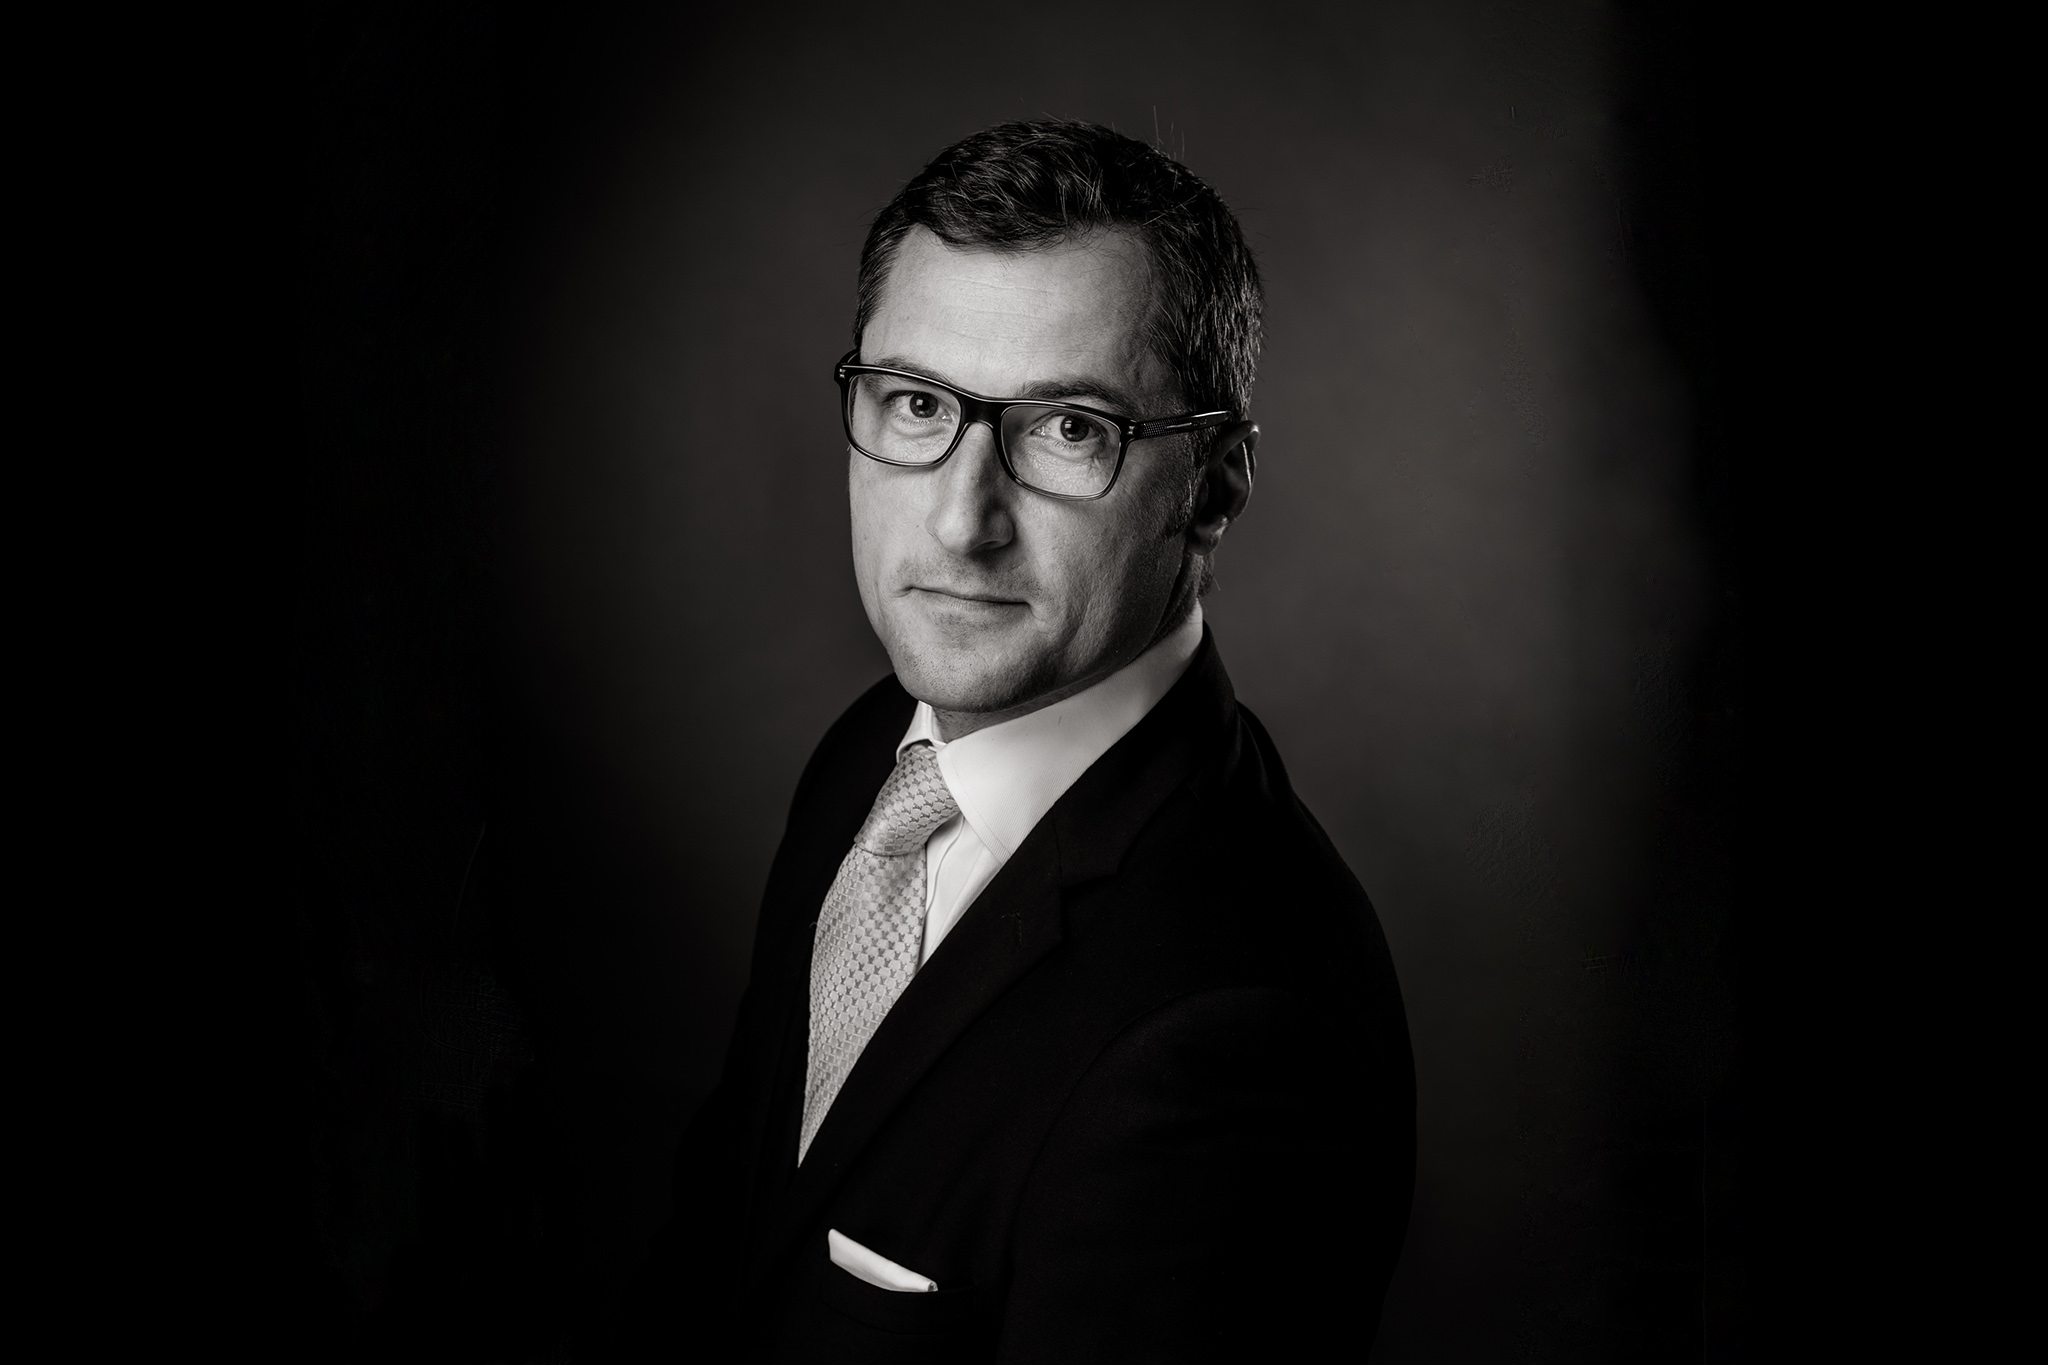 Franck A. WILLAIME